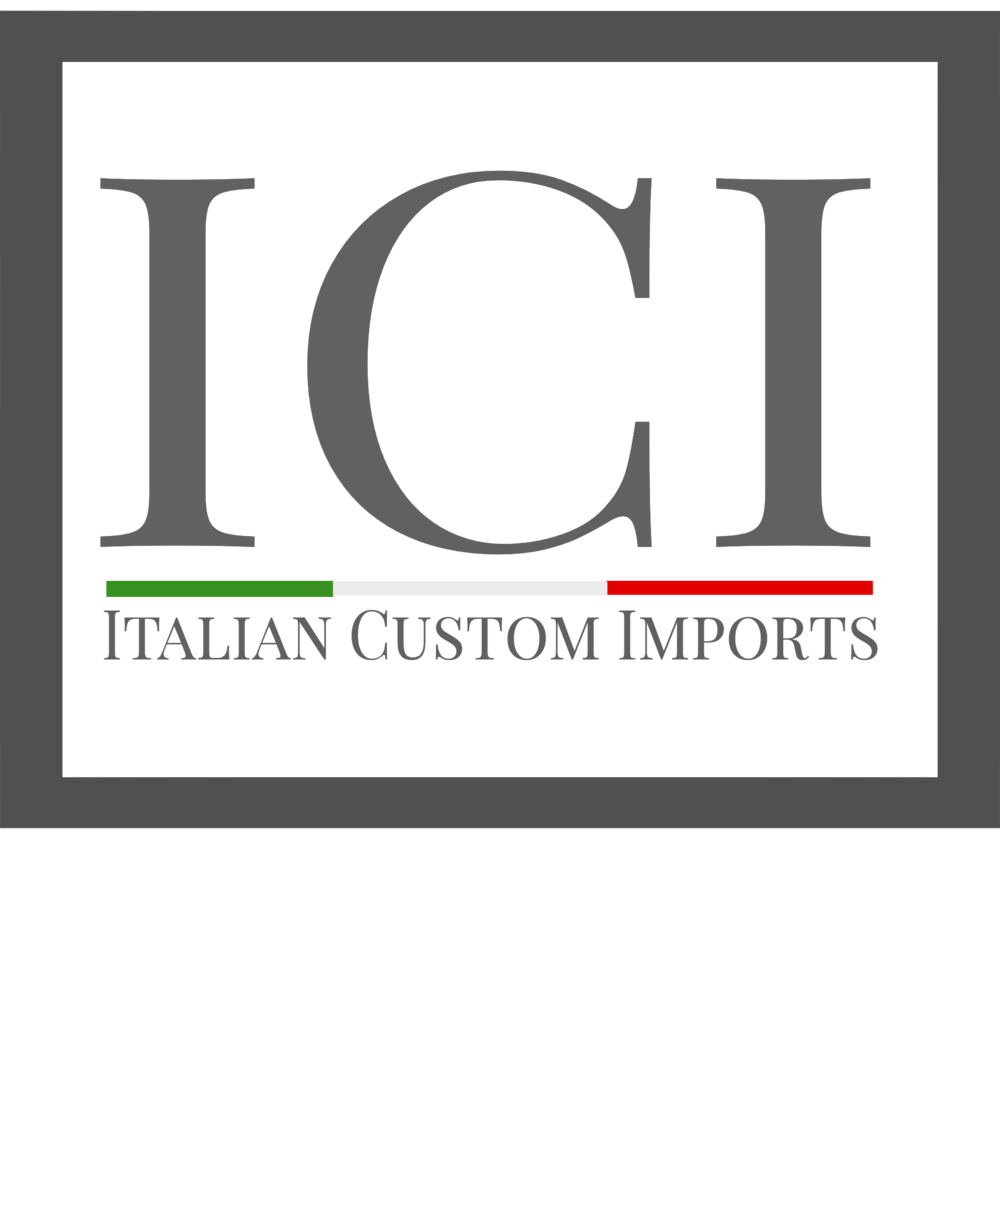 ici_logo (14).png